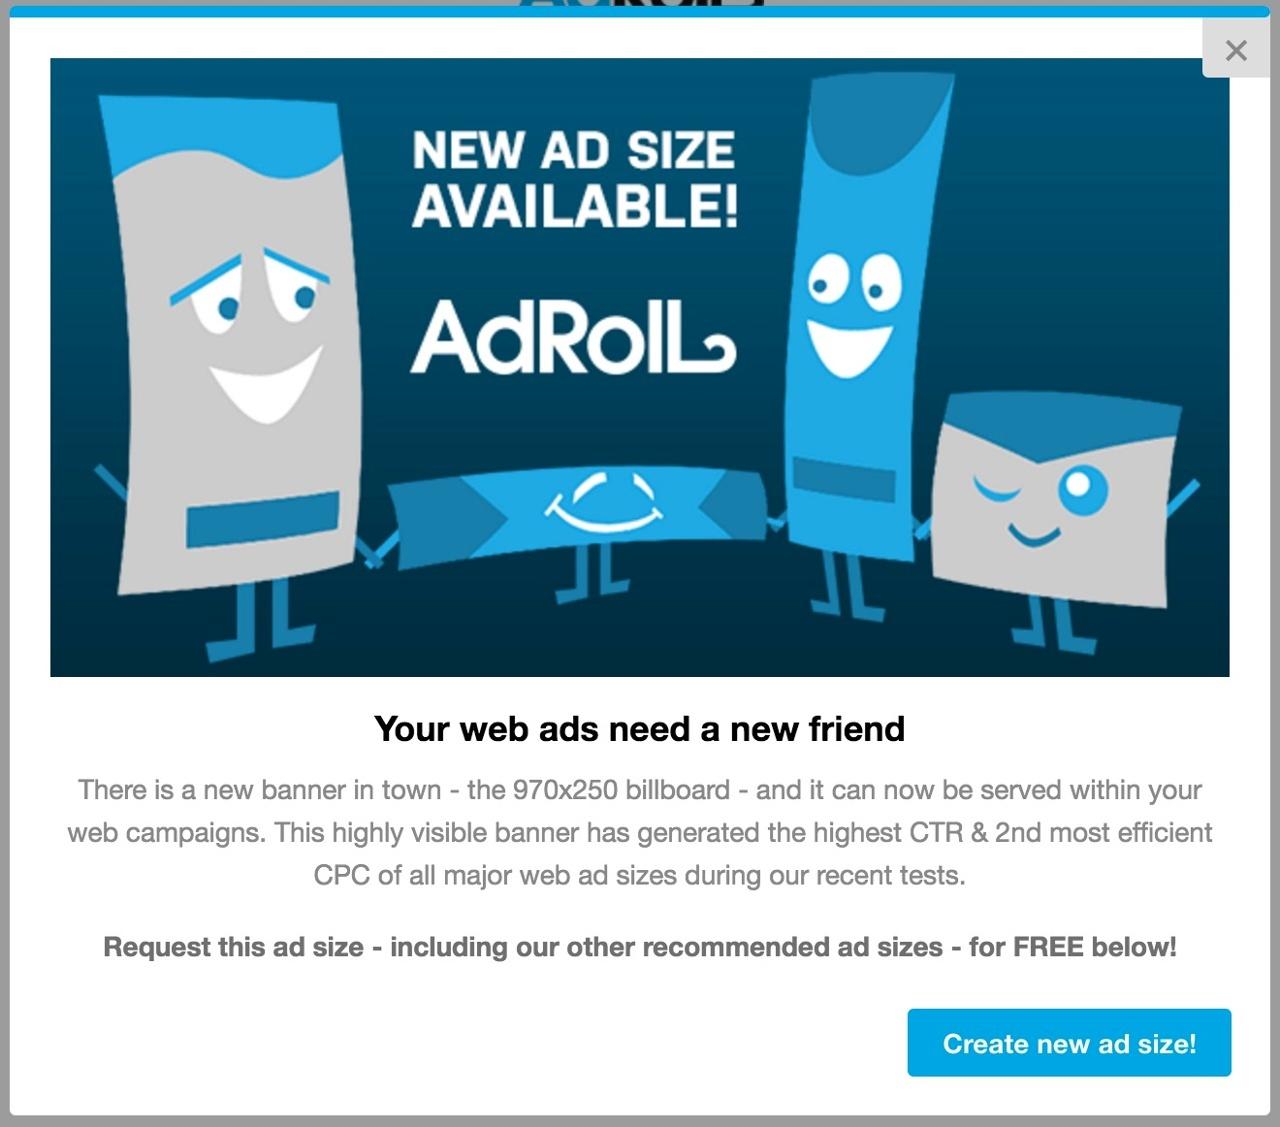 adroll-feature-release-3.jpg